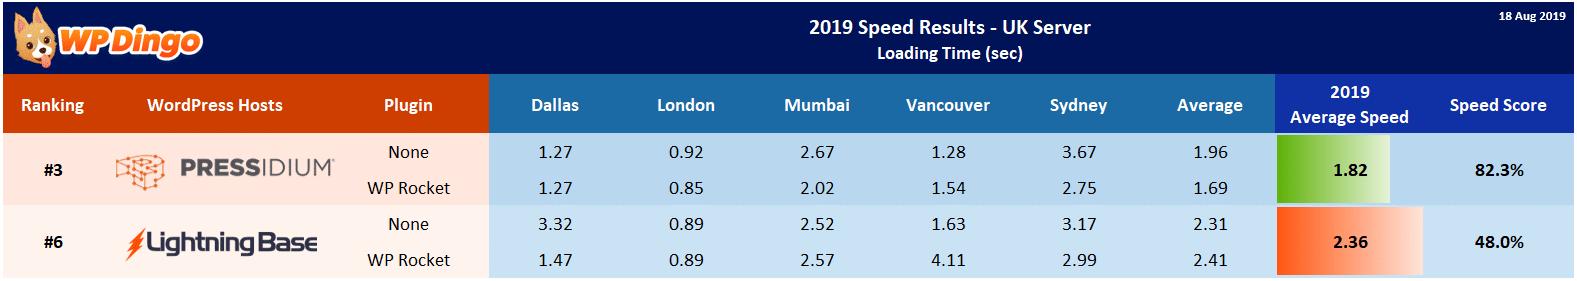 2019 Lightning Base vs Pressidium Speed Table - UK Server